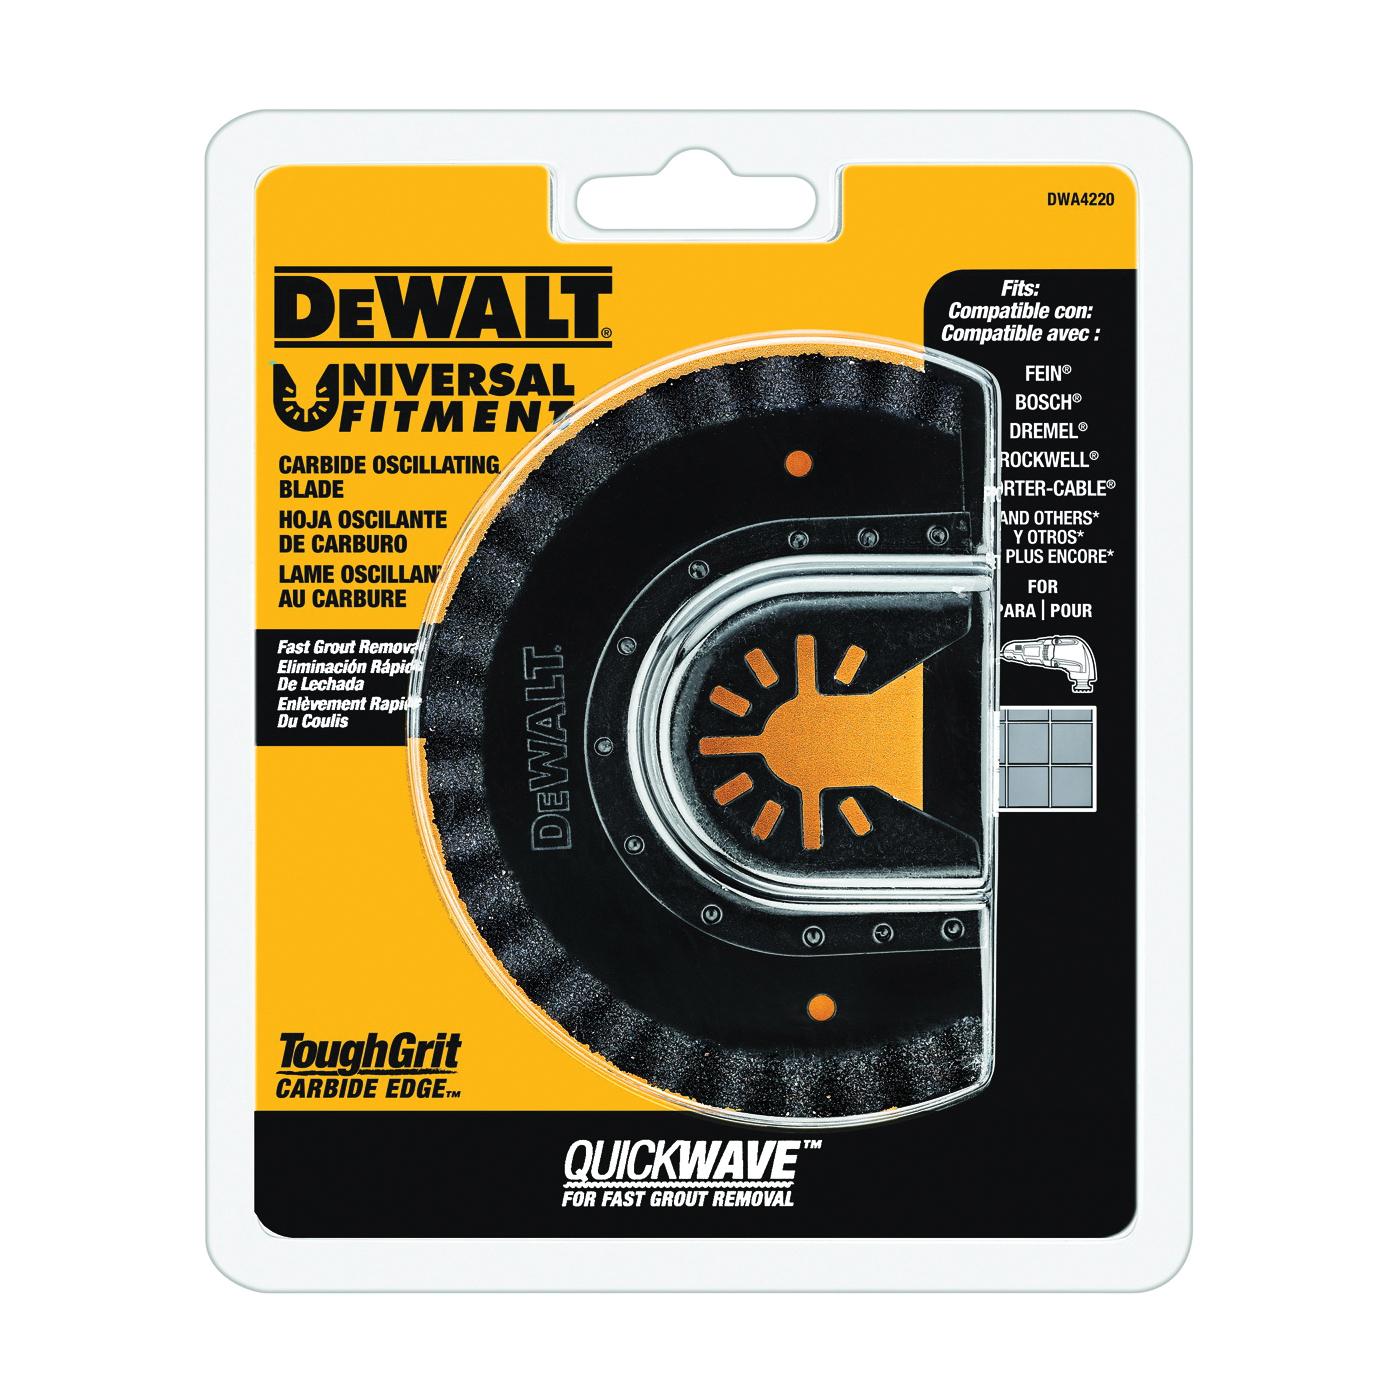 Picture of DeWALT DWA4220 Oscillating Blade, 3-5/8 in, Steel